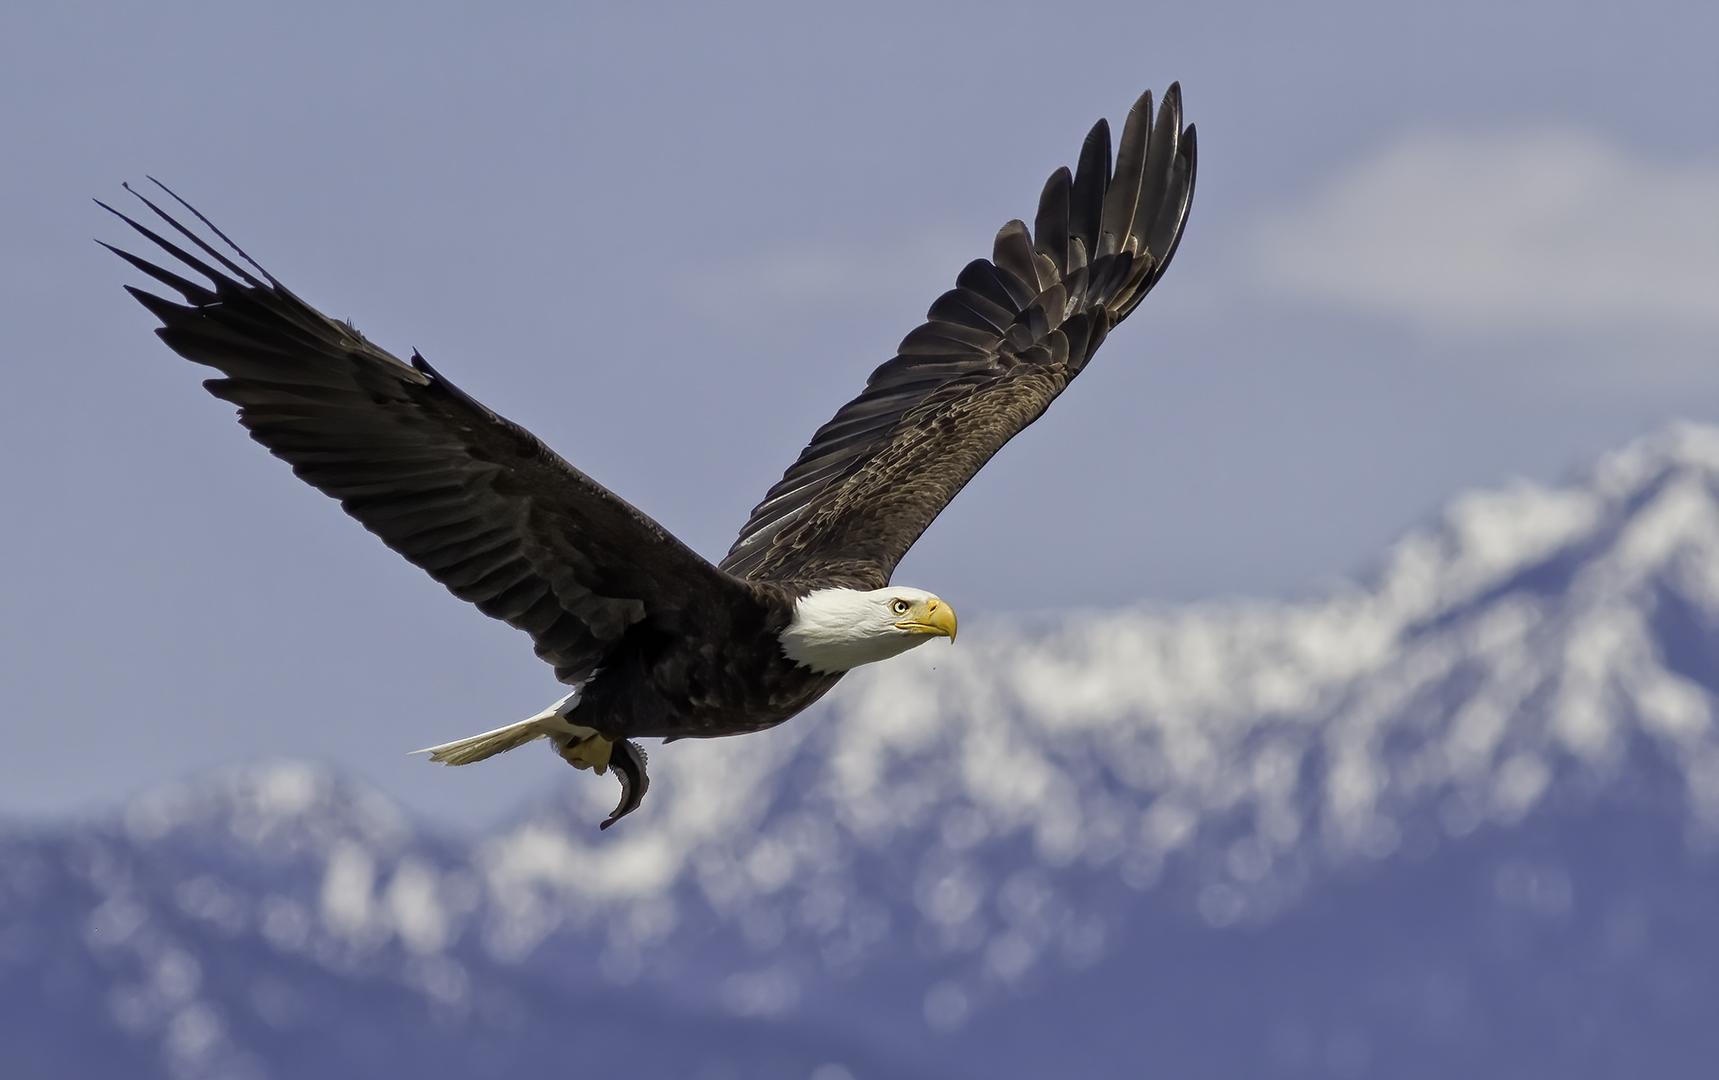 Roger Leekam – Bald Eagle with Fish – HM